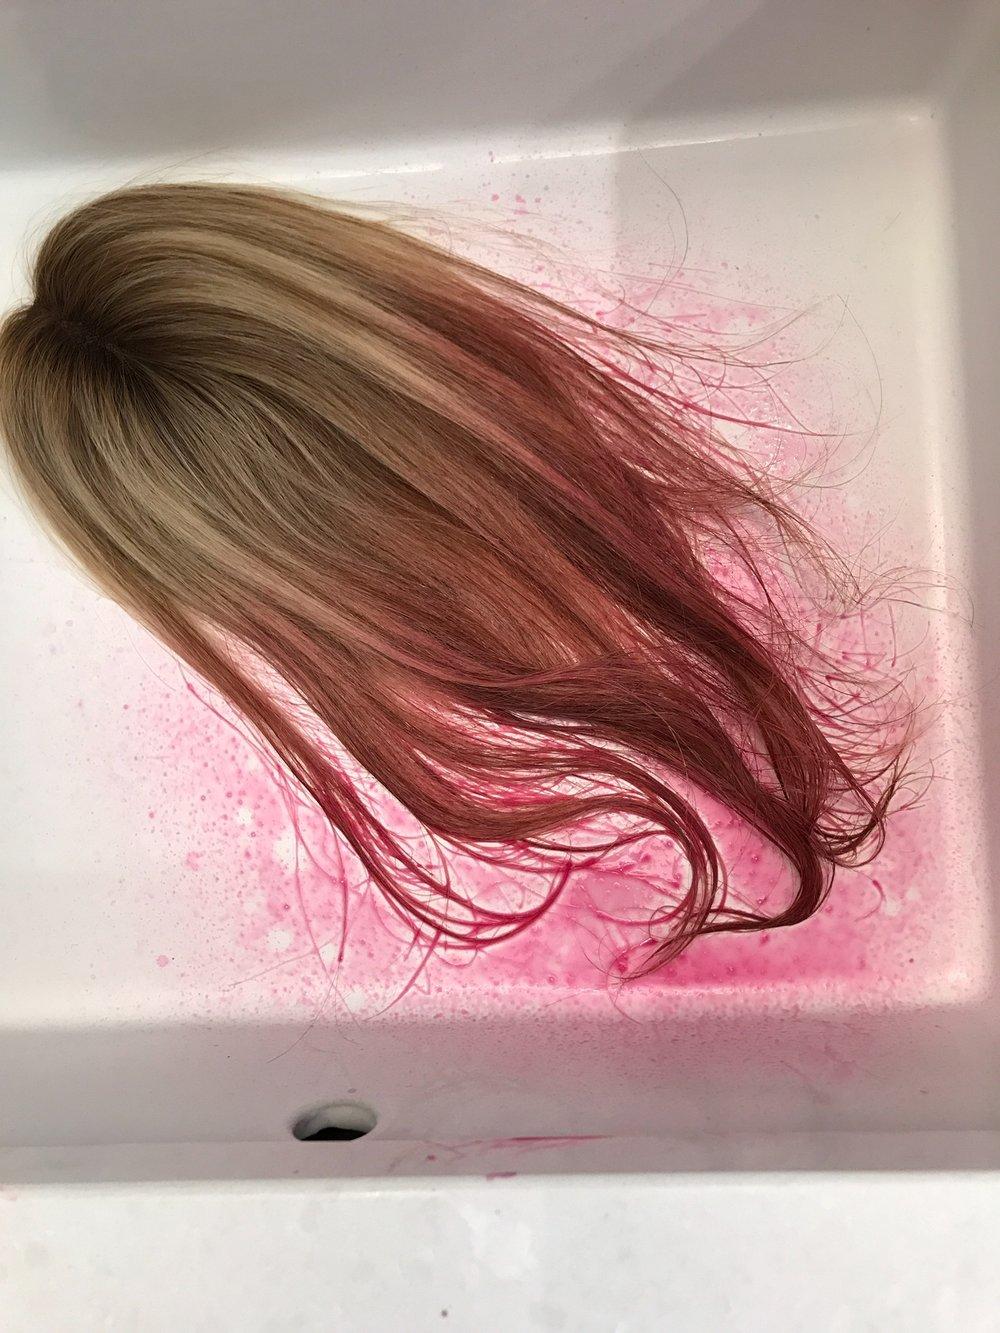 How To Get Rose Gold Pastel Pink Hair. Temporary spray in pink hair color. How to get pink hair. #pink #hair #tutorial